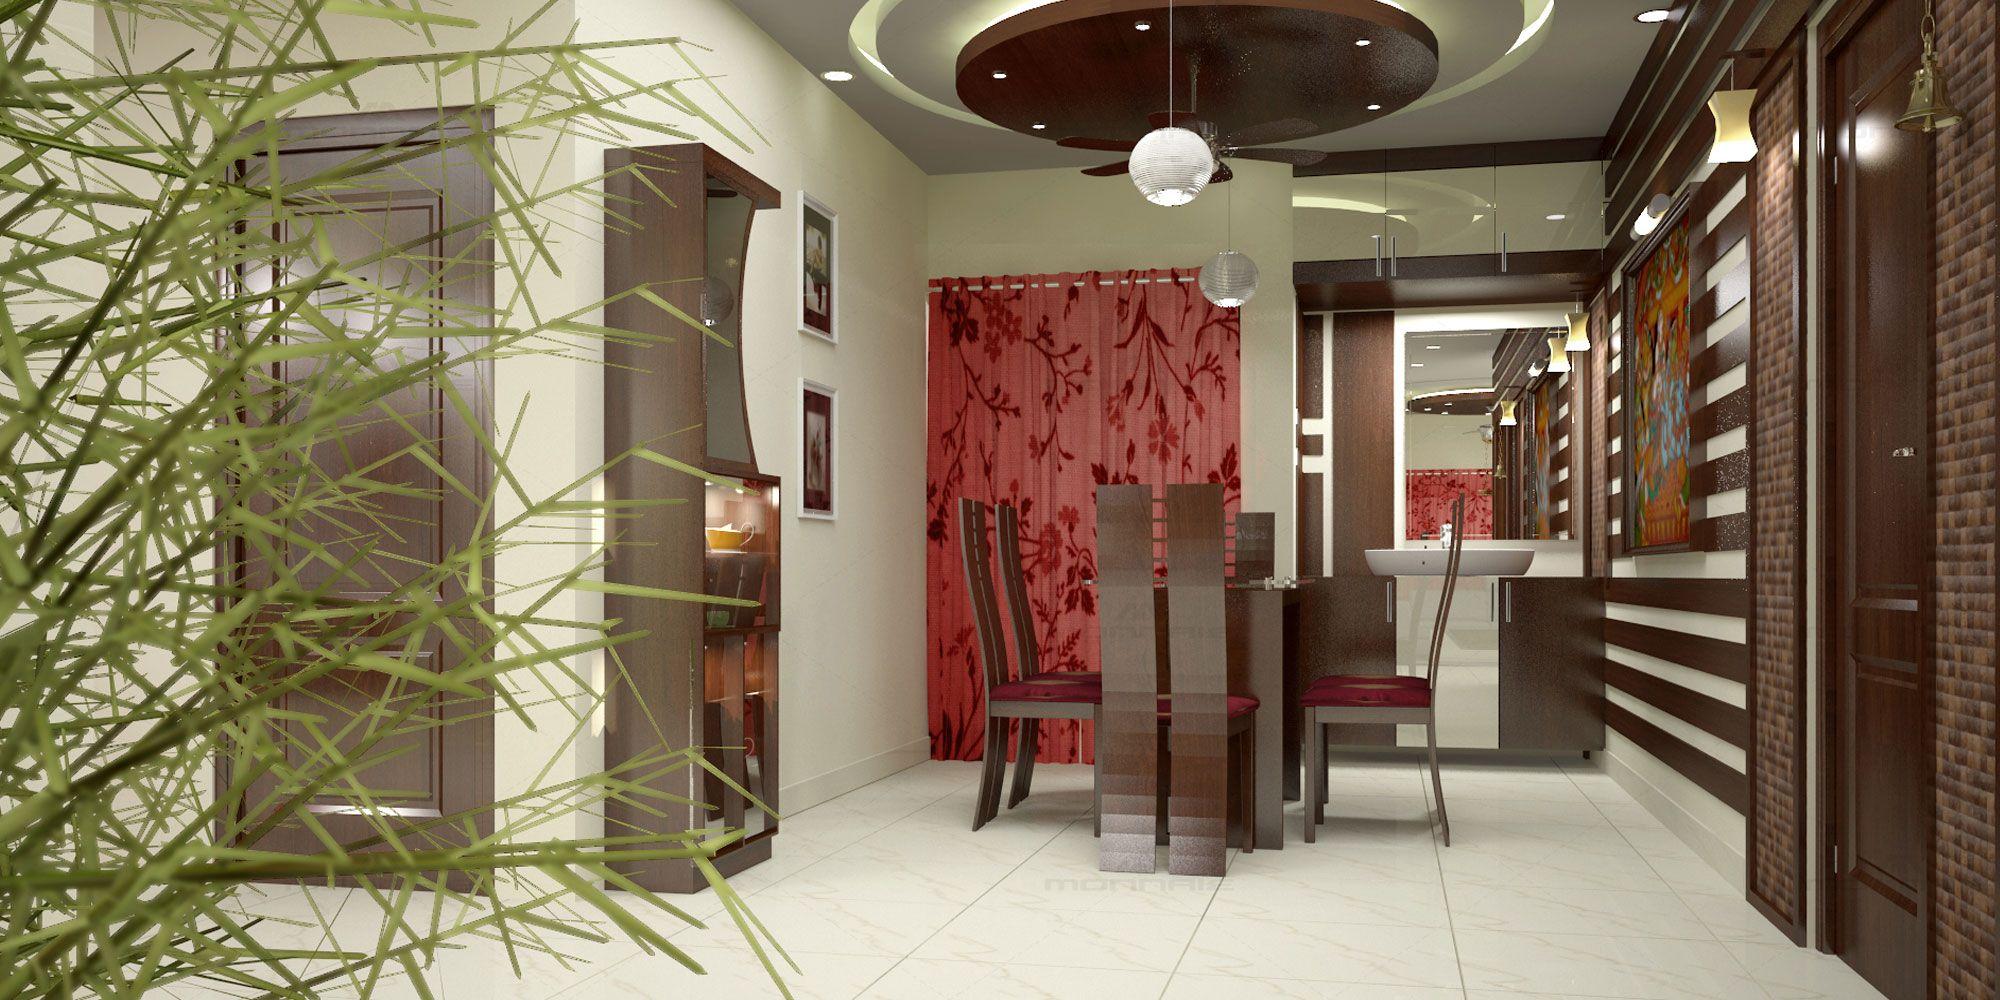 Feel Interesting Appealing Interior Decorating Interior Design